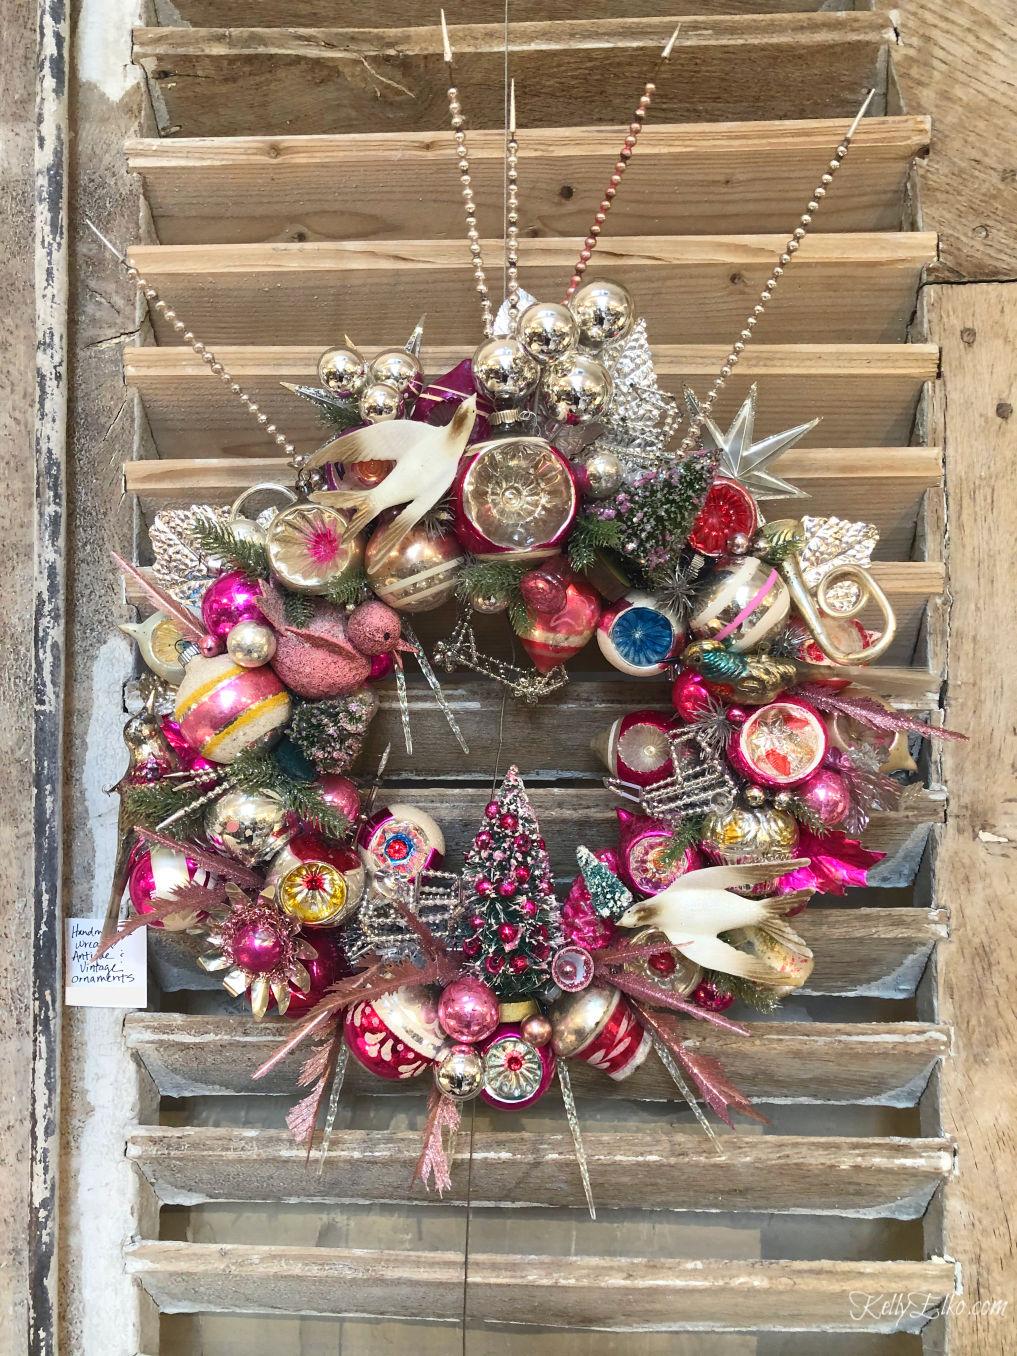 Vintage Christmas Ornament Wreath kellyelko.com #vintagechristmas #christmaswreath #vintagewreath #christmascrafts #diychristmas #kellyelko